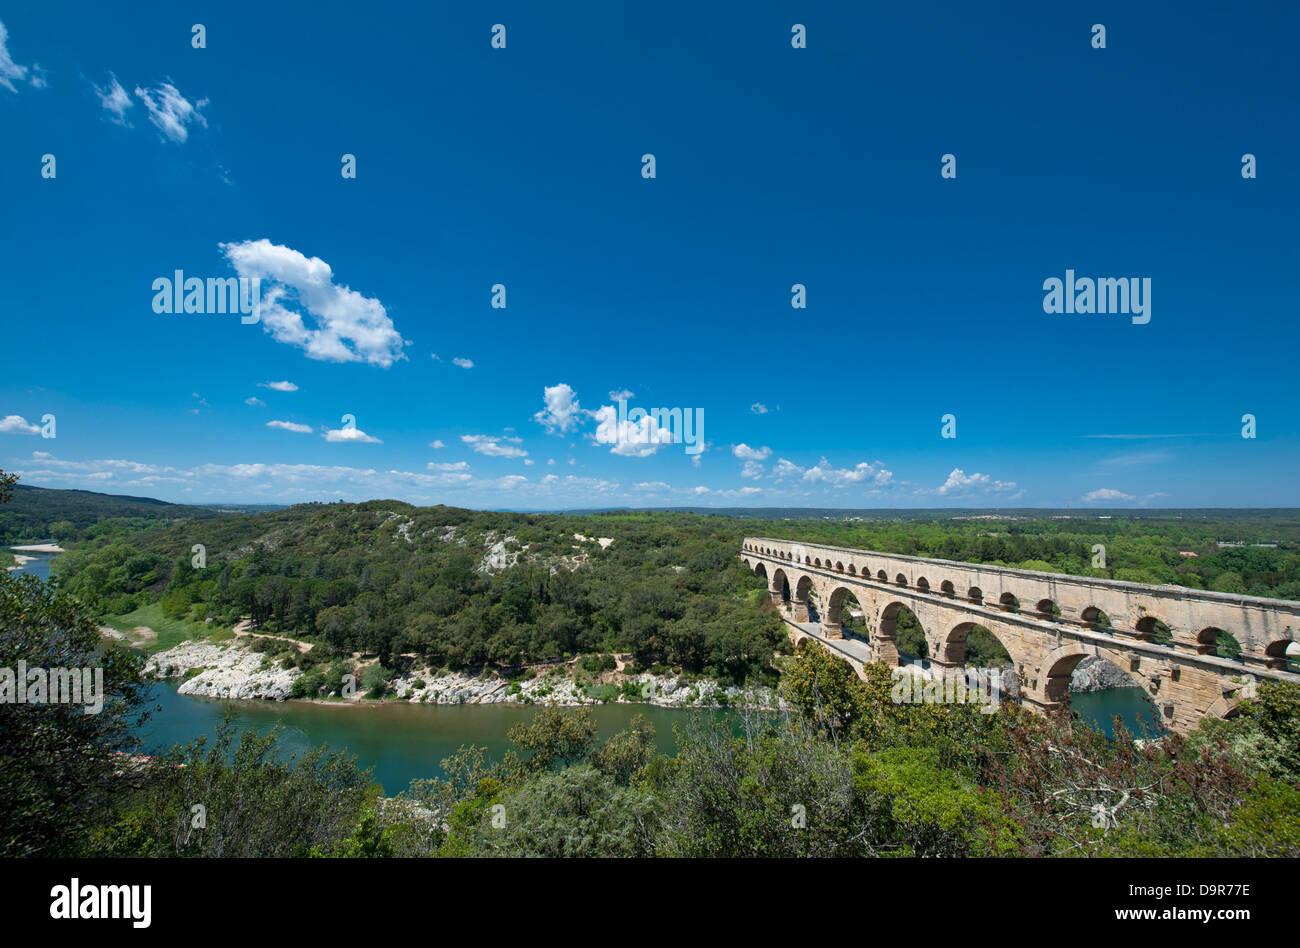 UNESCO world heritage site Pont du Gard, a Roman aqueduct passing the Gard river in the Gard near Nîmes, southern - Stock Image